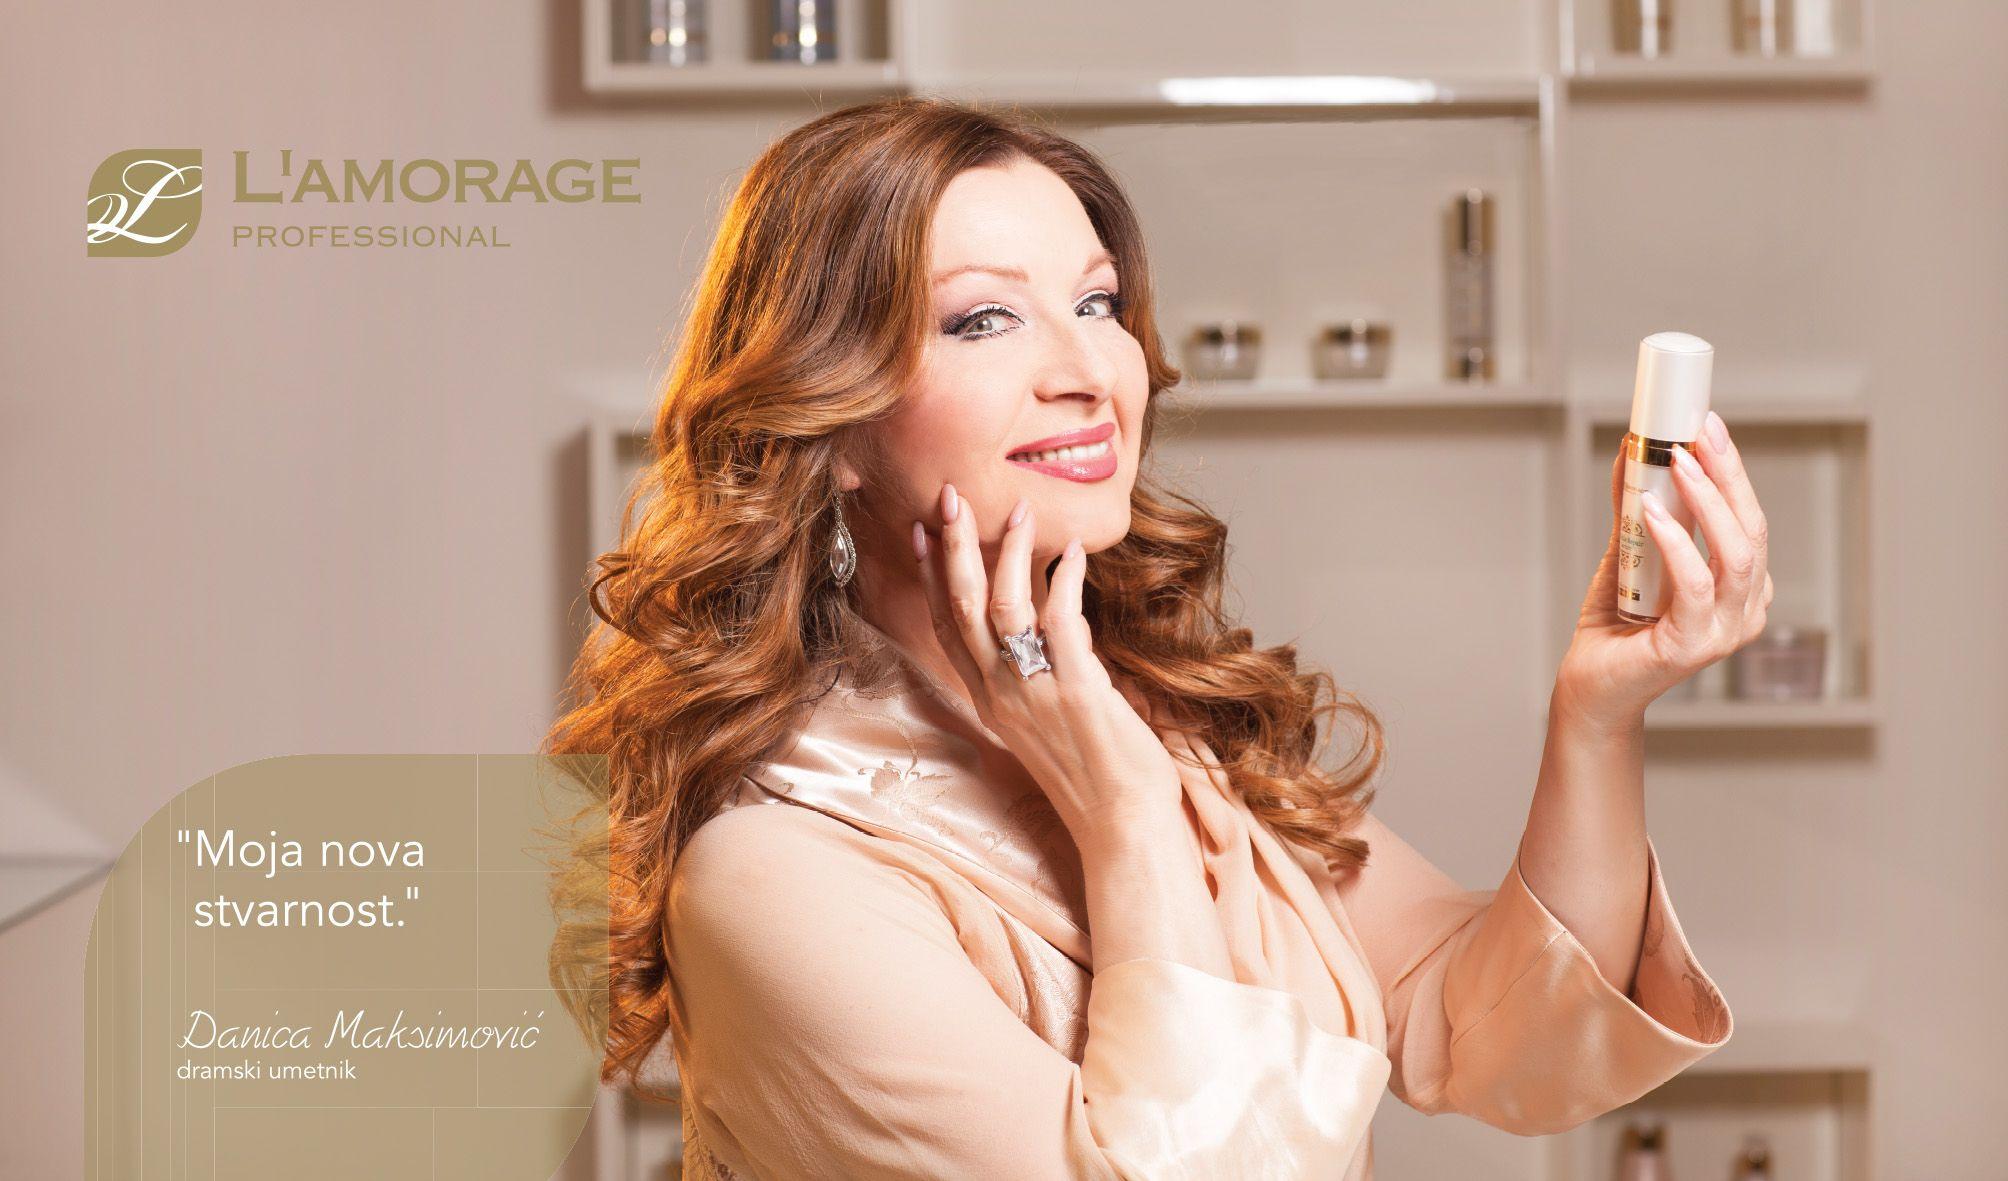 Famous Serbian stars admire the LAMORAGE cosmetic #